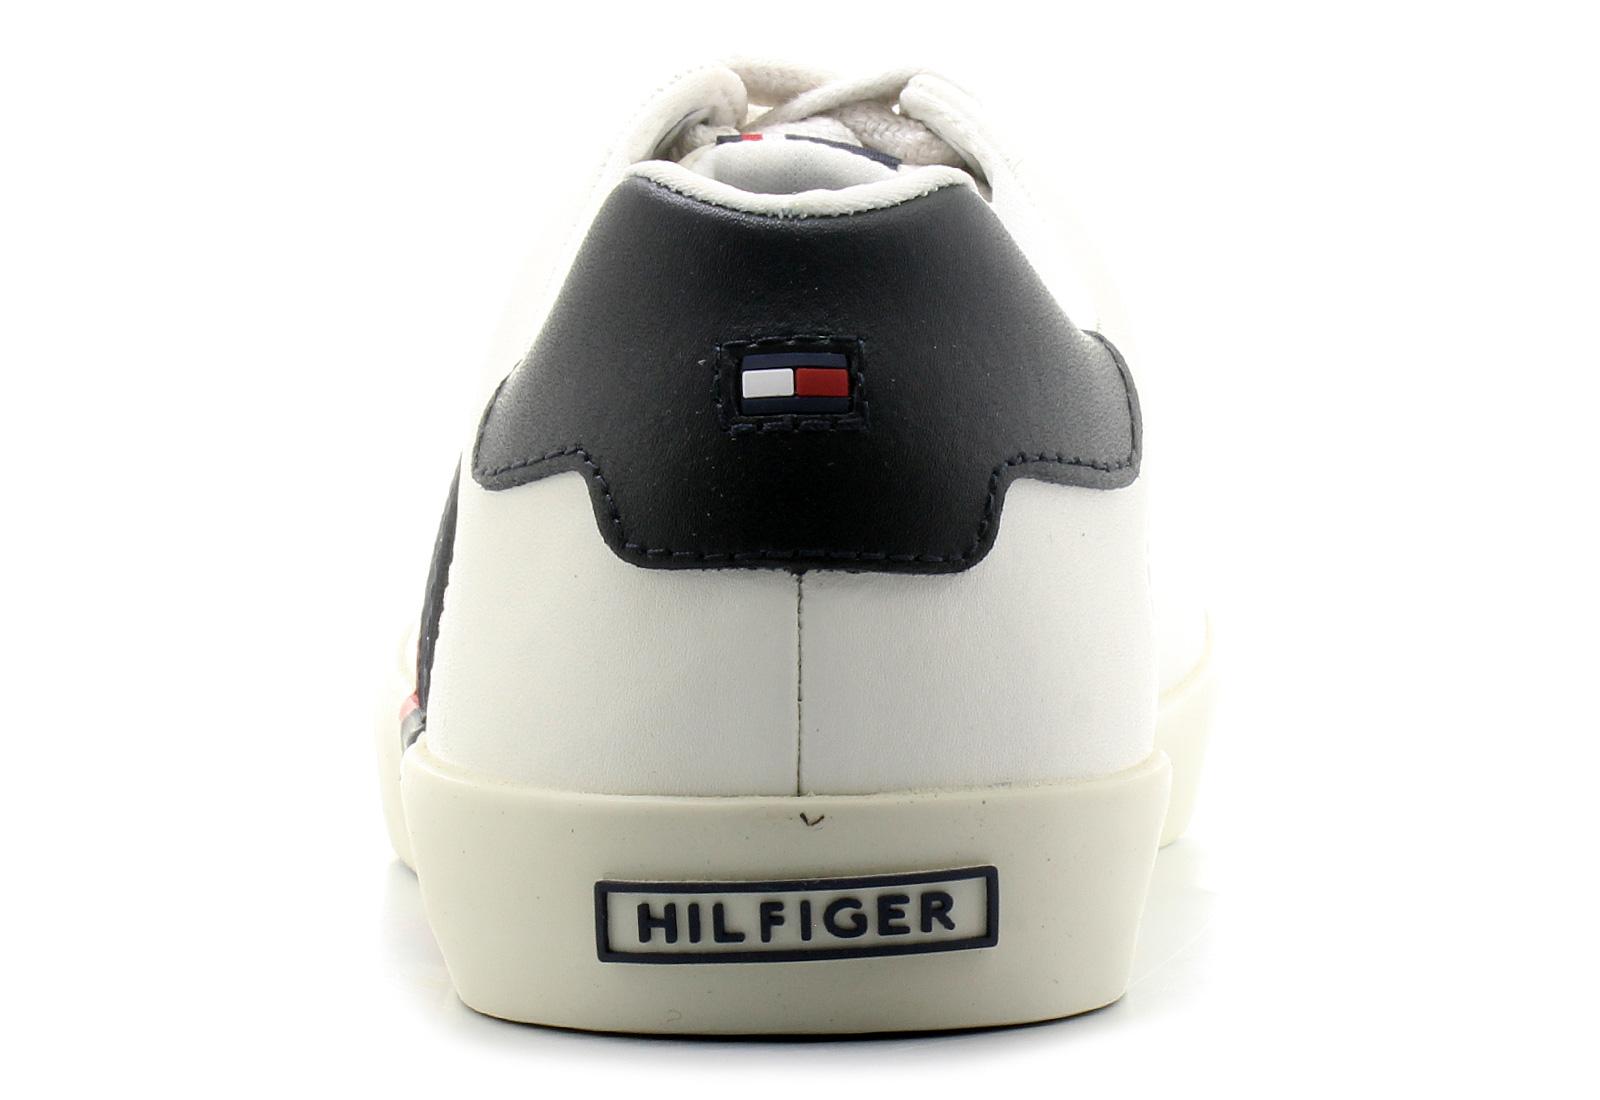 e4809225daf7d Tommy Hilfiger Shoes - Volley 5a - 15F-0557-156 - Online shop for ...